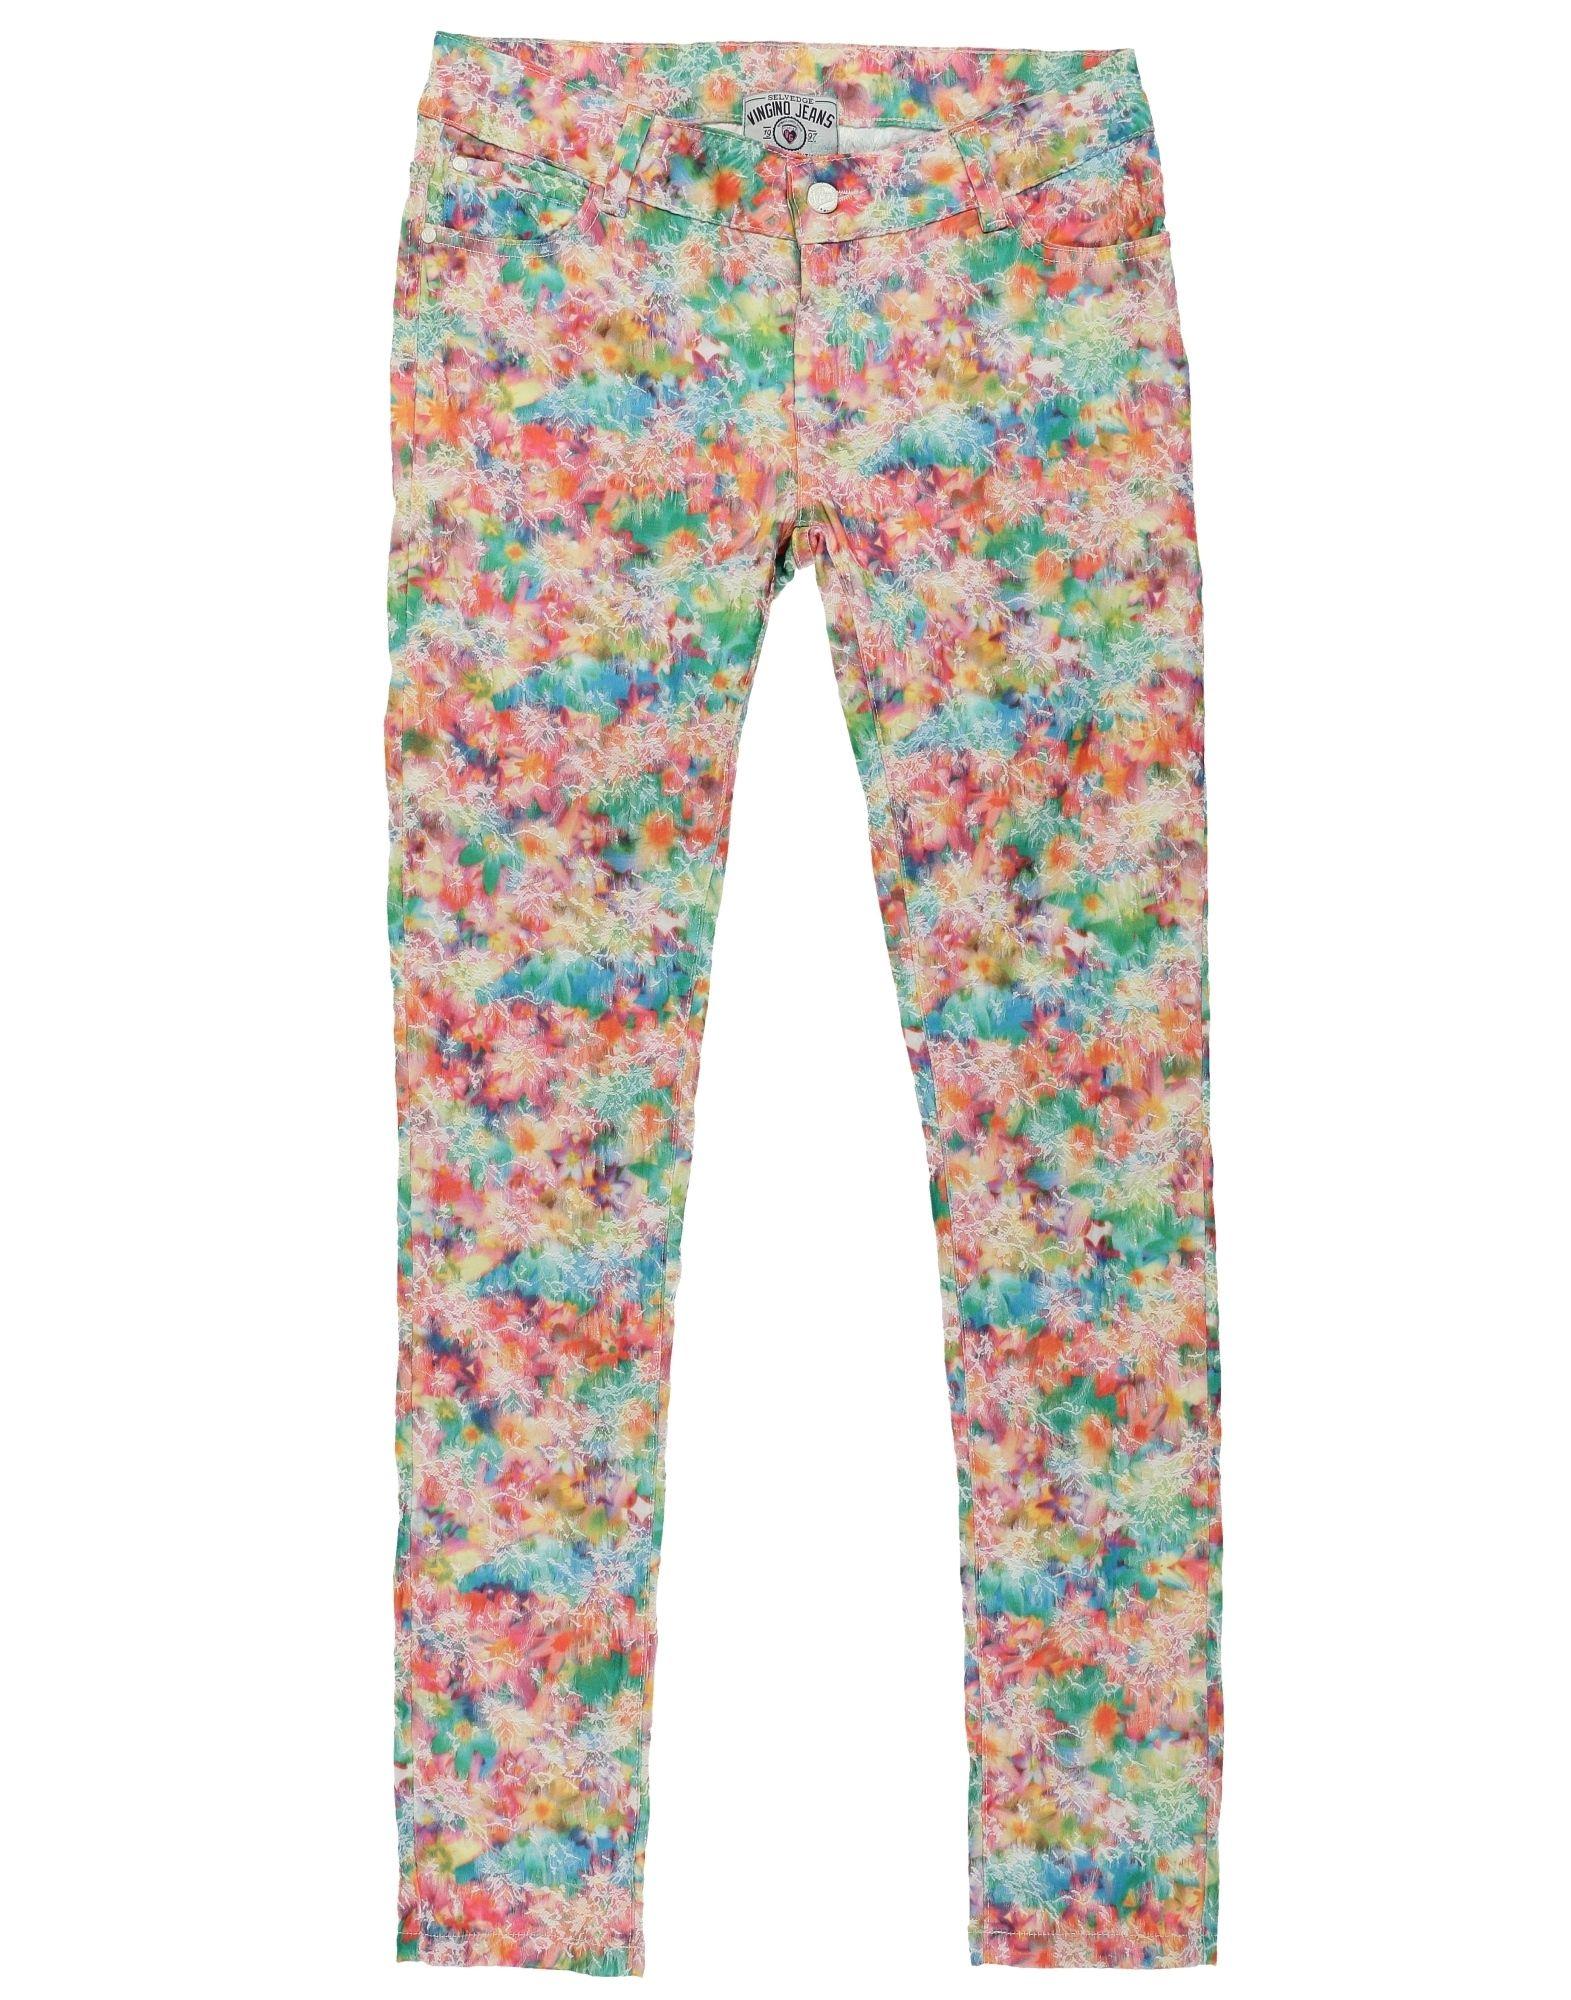 Pantalone Pantalone Pantalone Vingino donna - 36978489AD 5c3